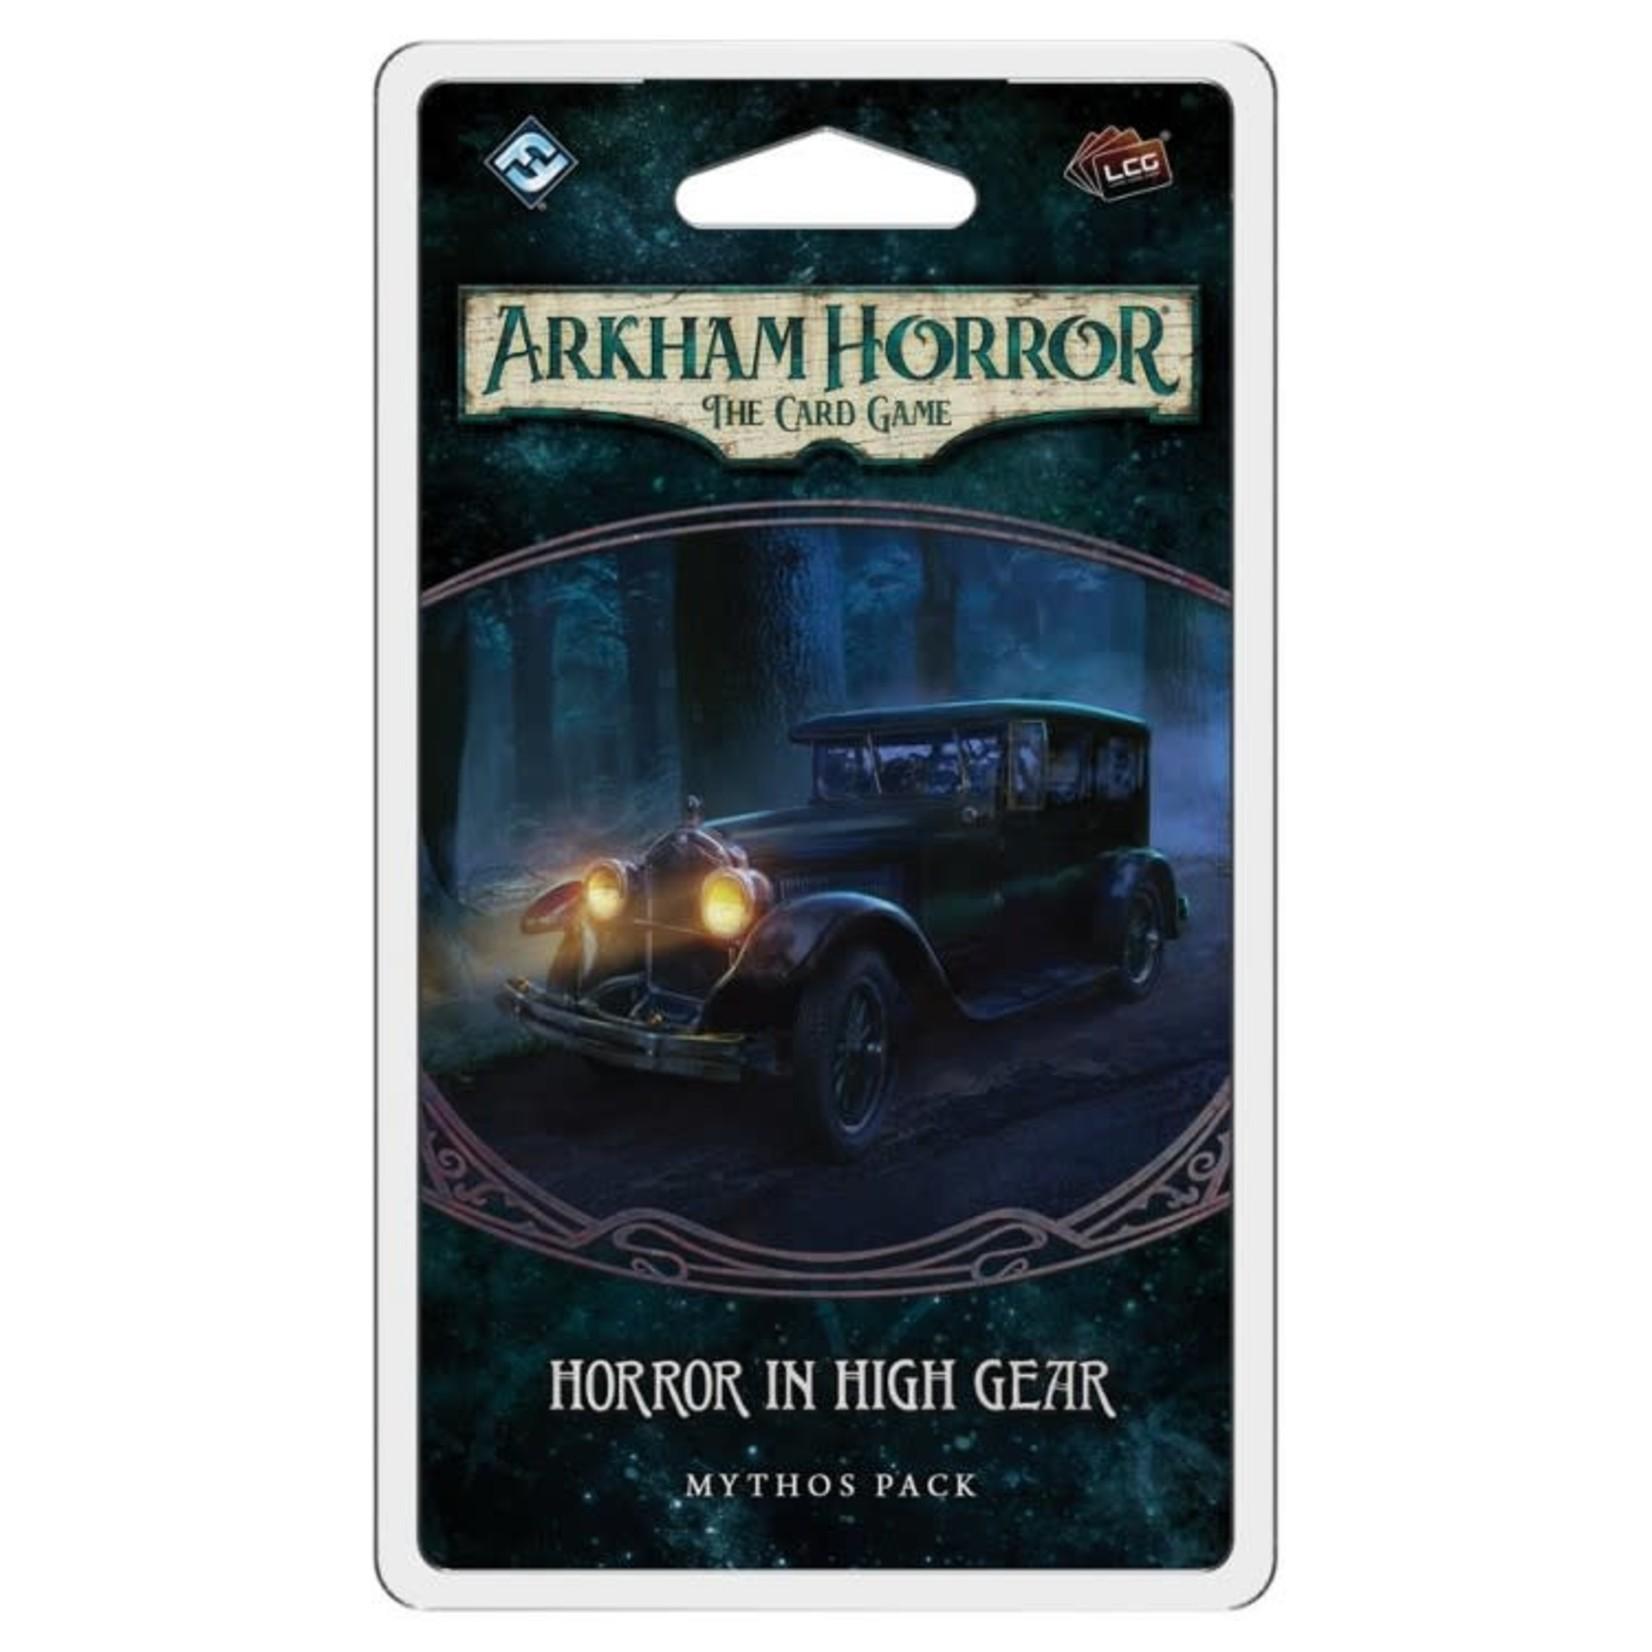 Fantasy Flight Games Arkham Horror LCG: Horror in High Gear Mythos Pack (Innsmouth Conspiracy Pack 3)